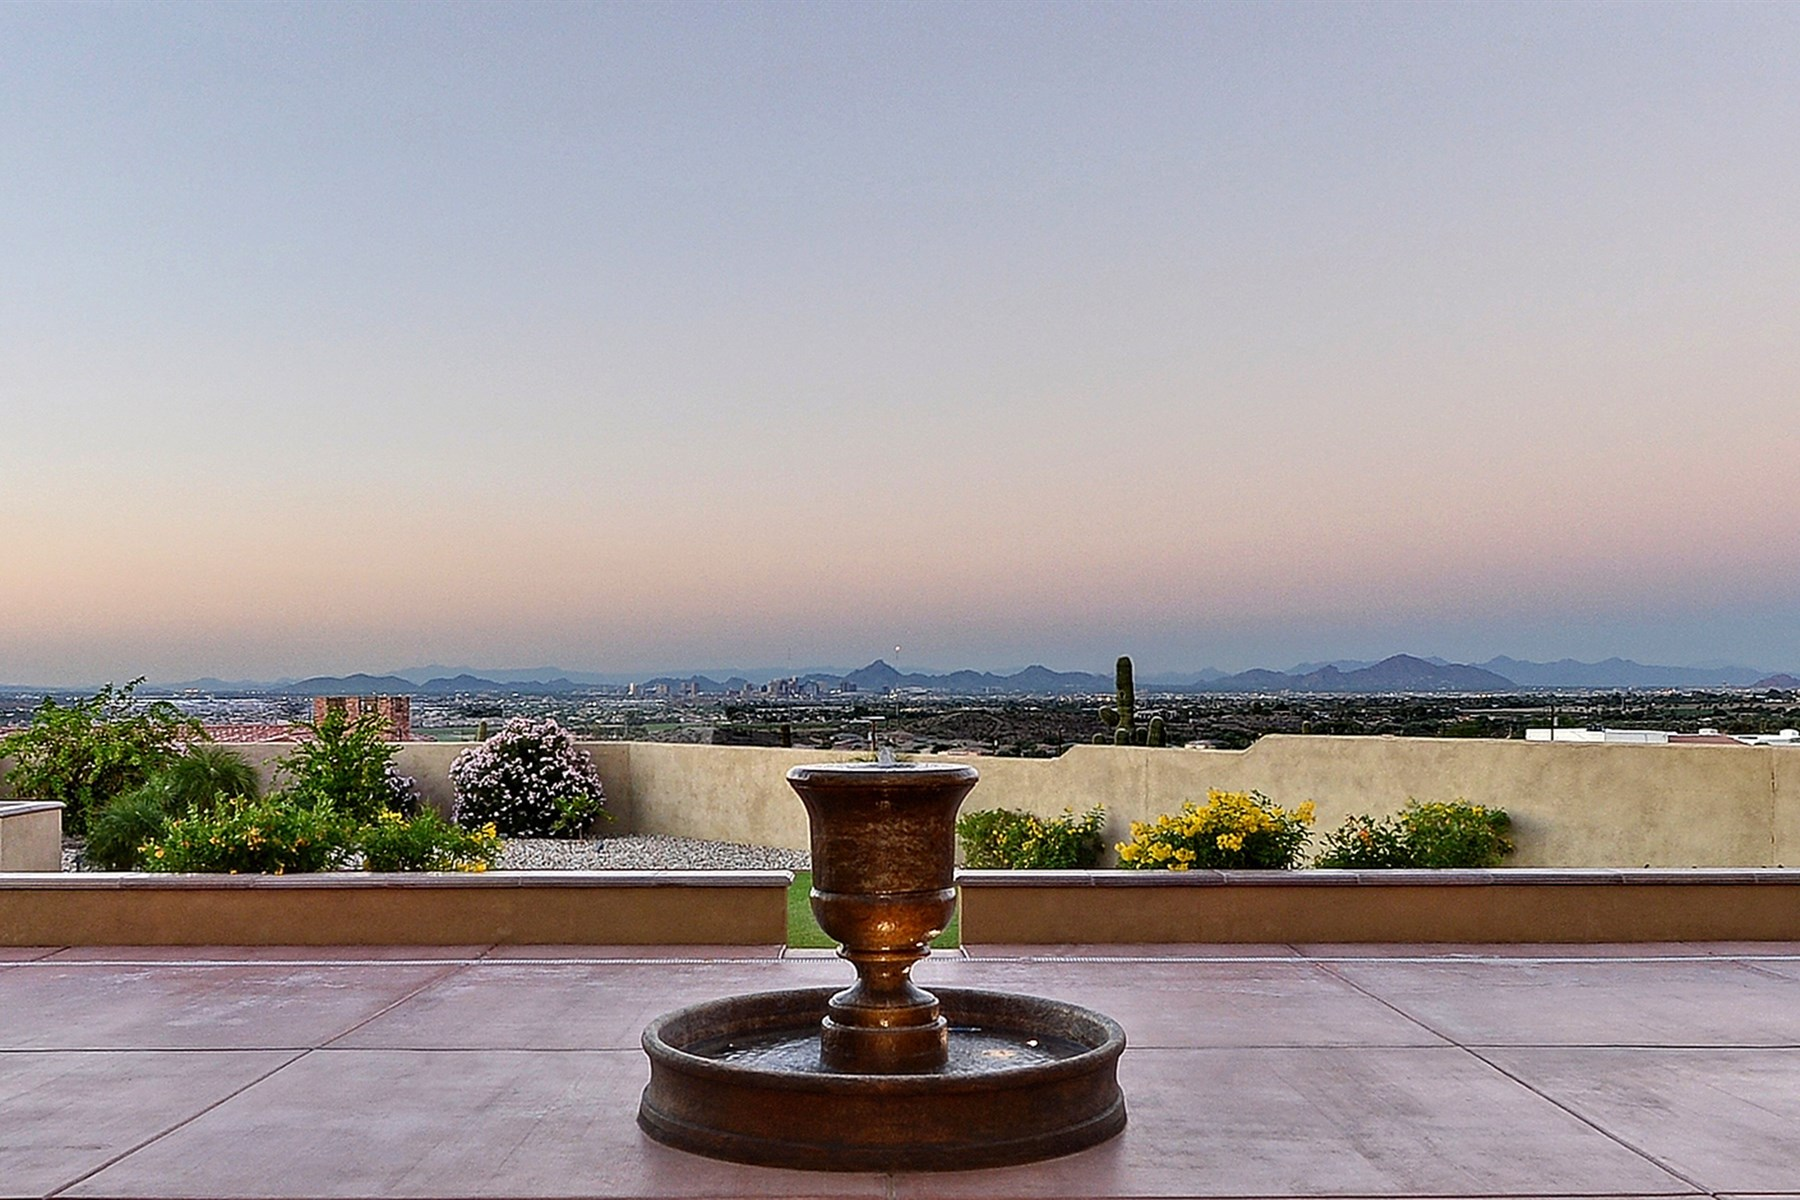 Casa Unifamiliar por un Venta en Beautiful gated home is situated on 2.5 private acres 10456 S 25th Ave Phoenix, Arizona 85041 Estados Unidos